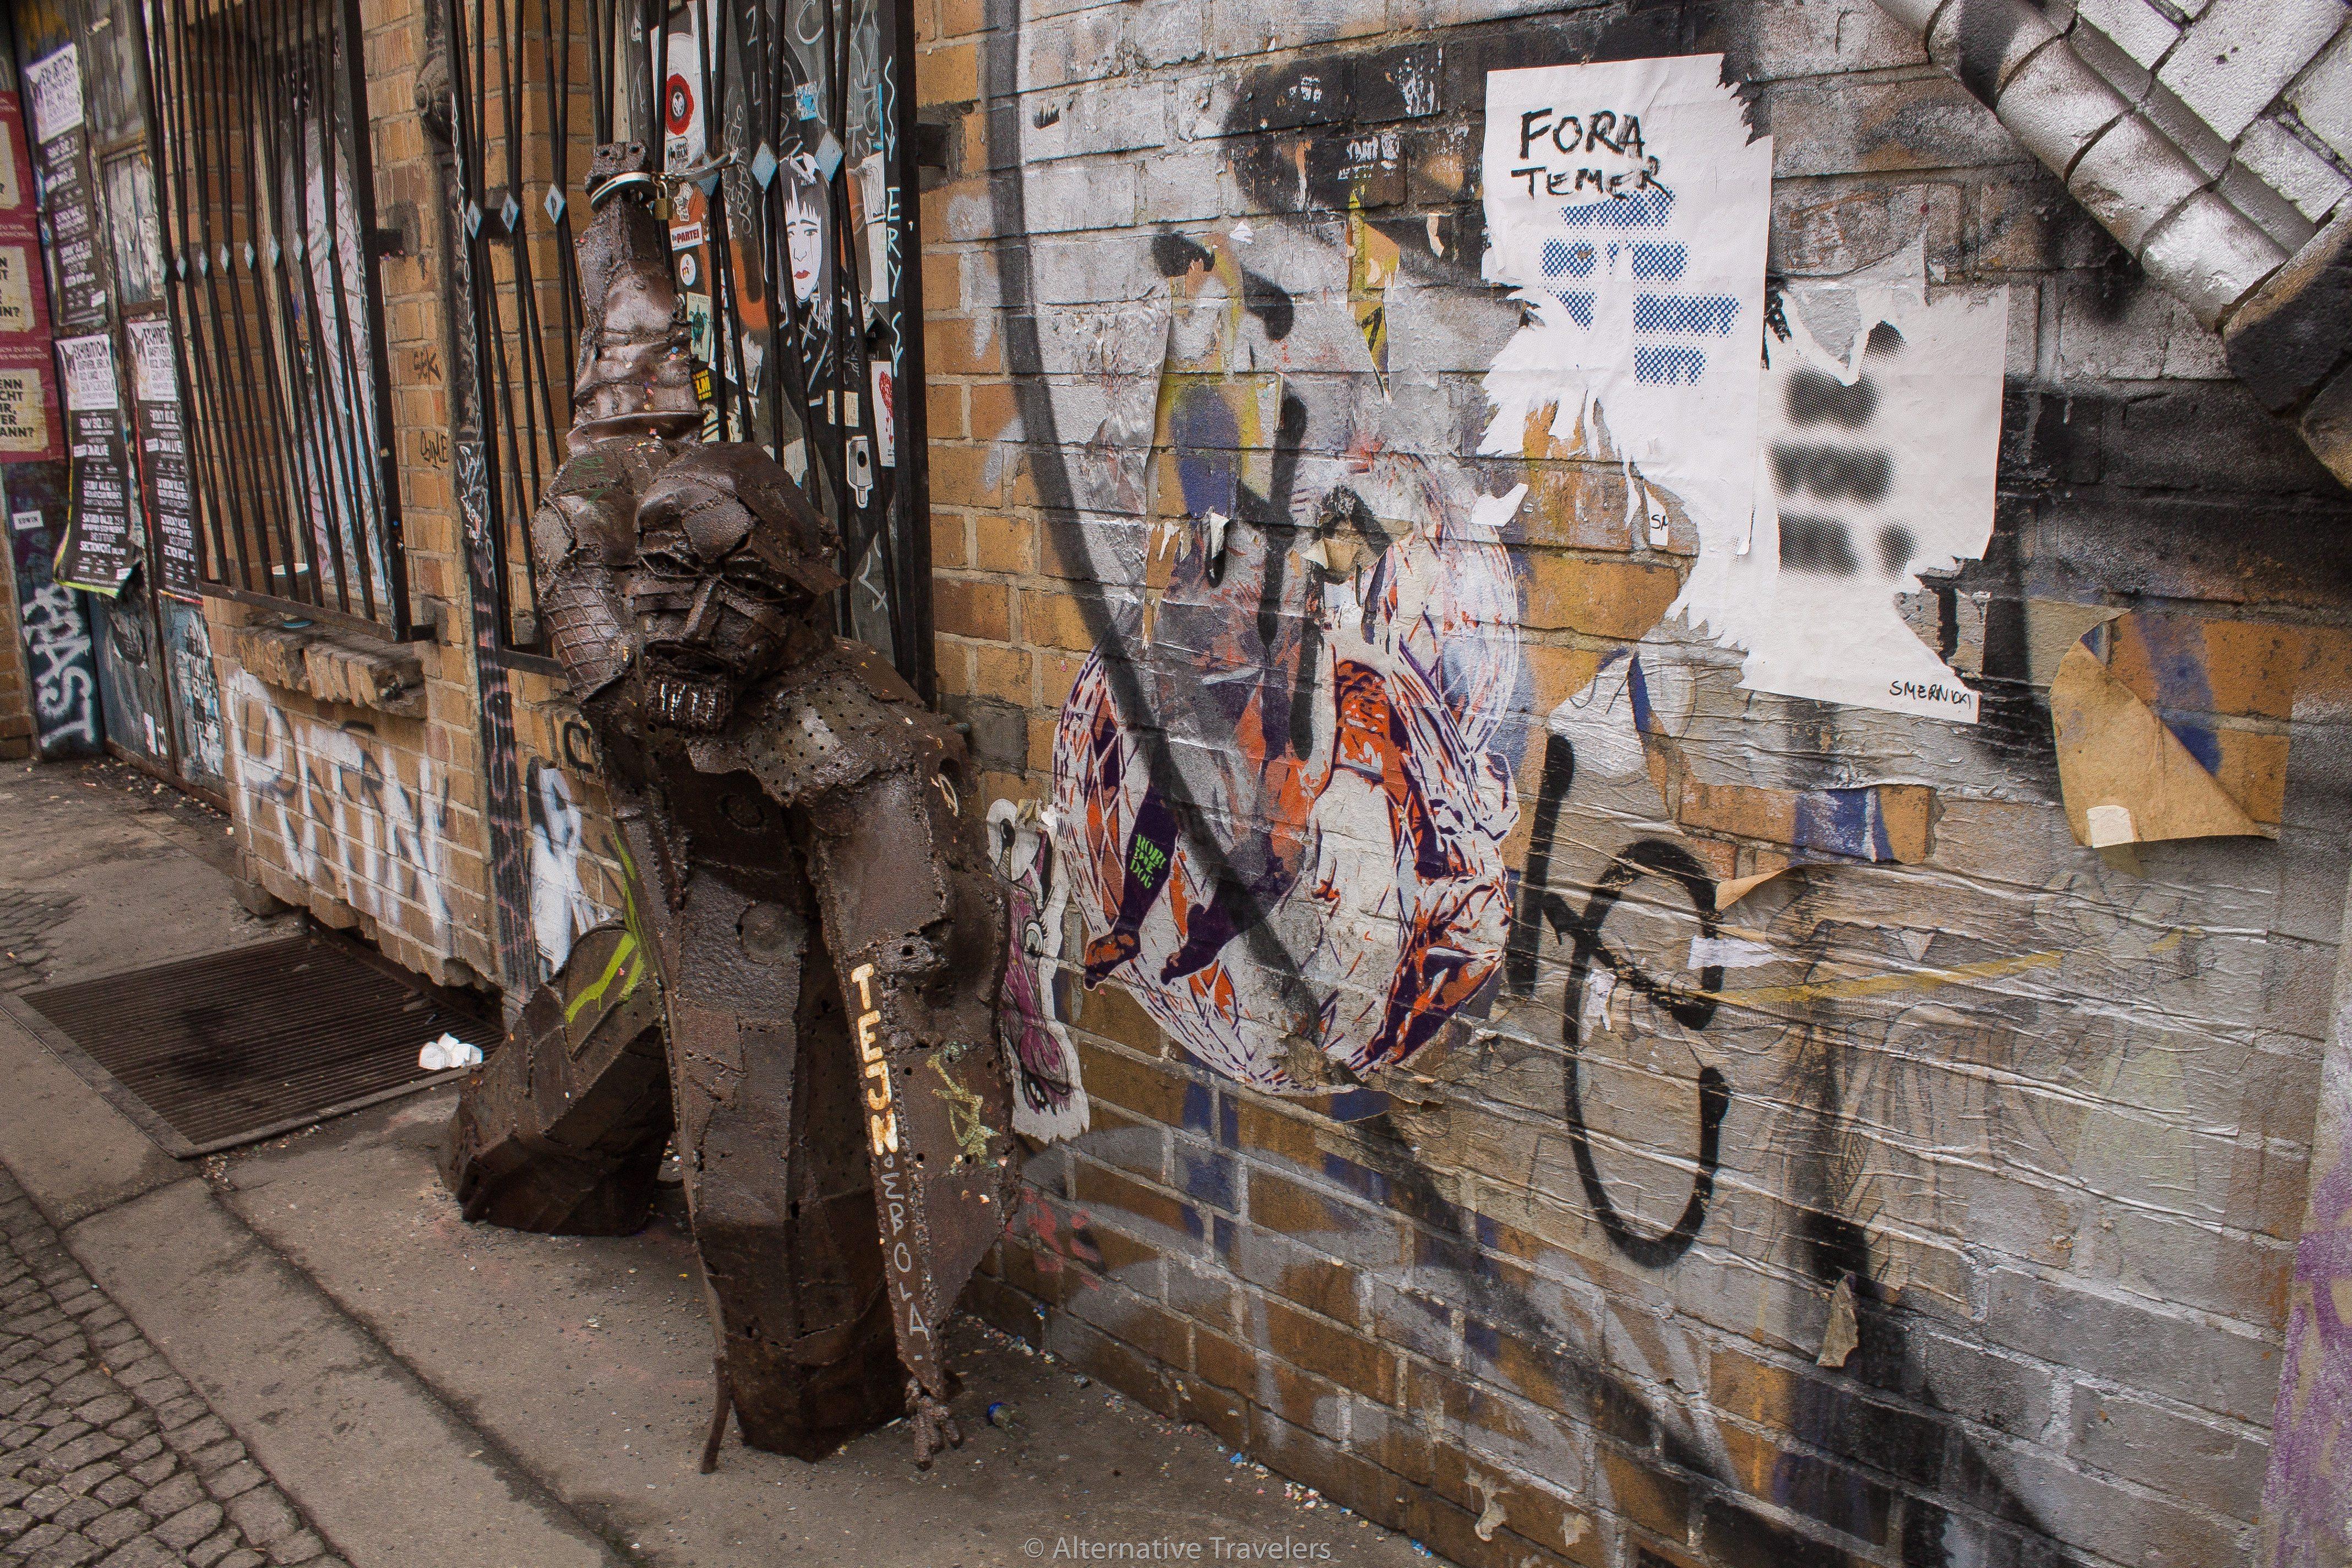 Tejn metal piece - Berlin street art | AlternativeTravelers.com